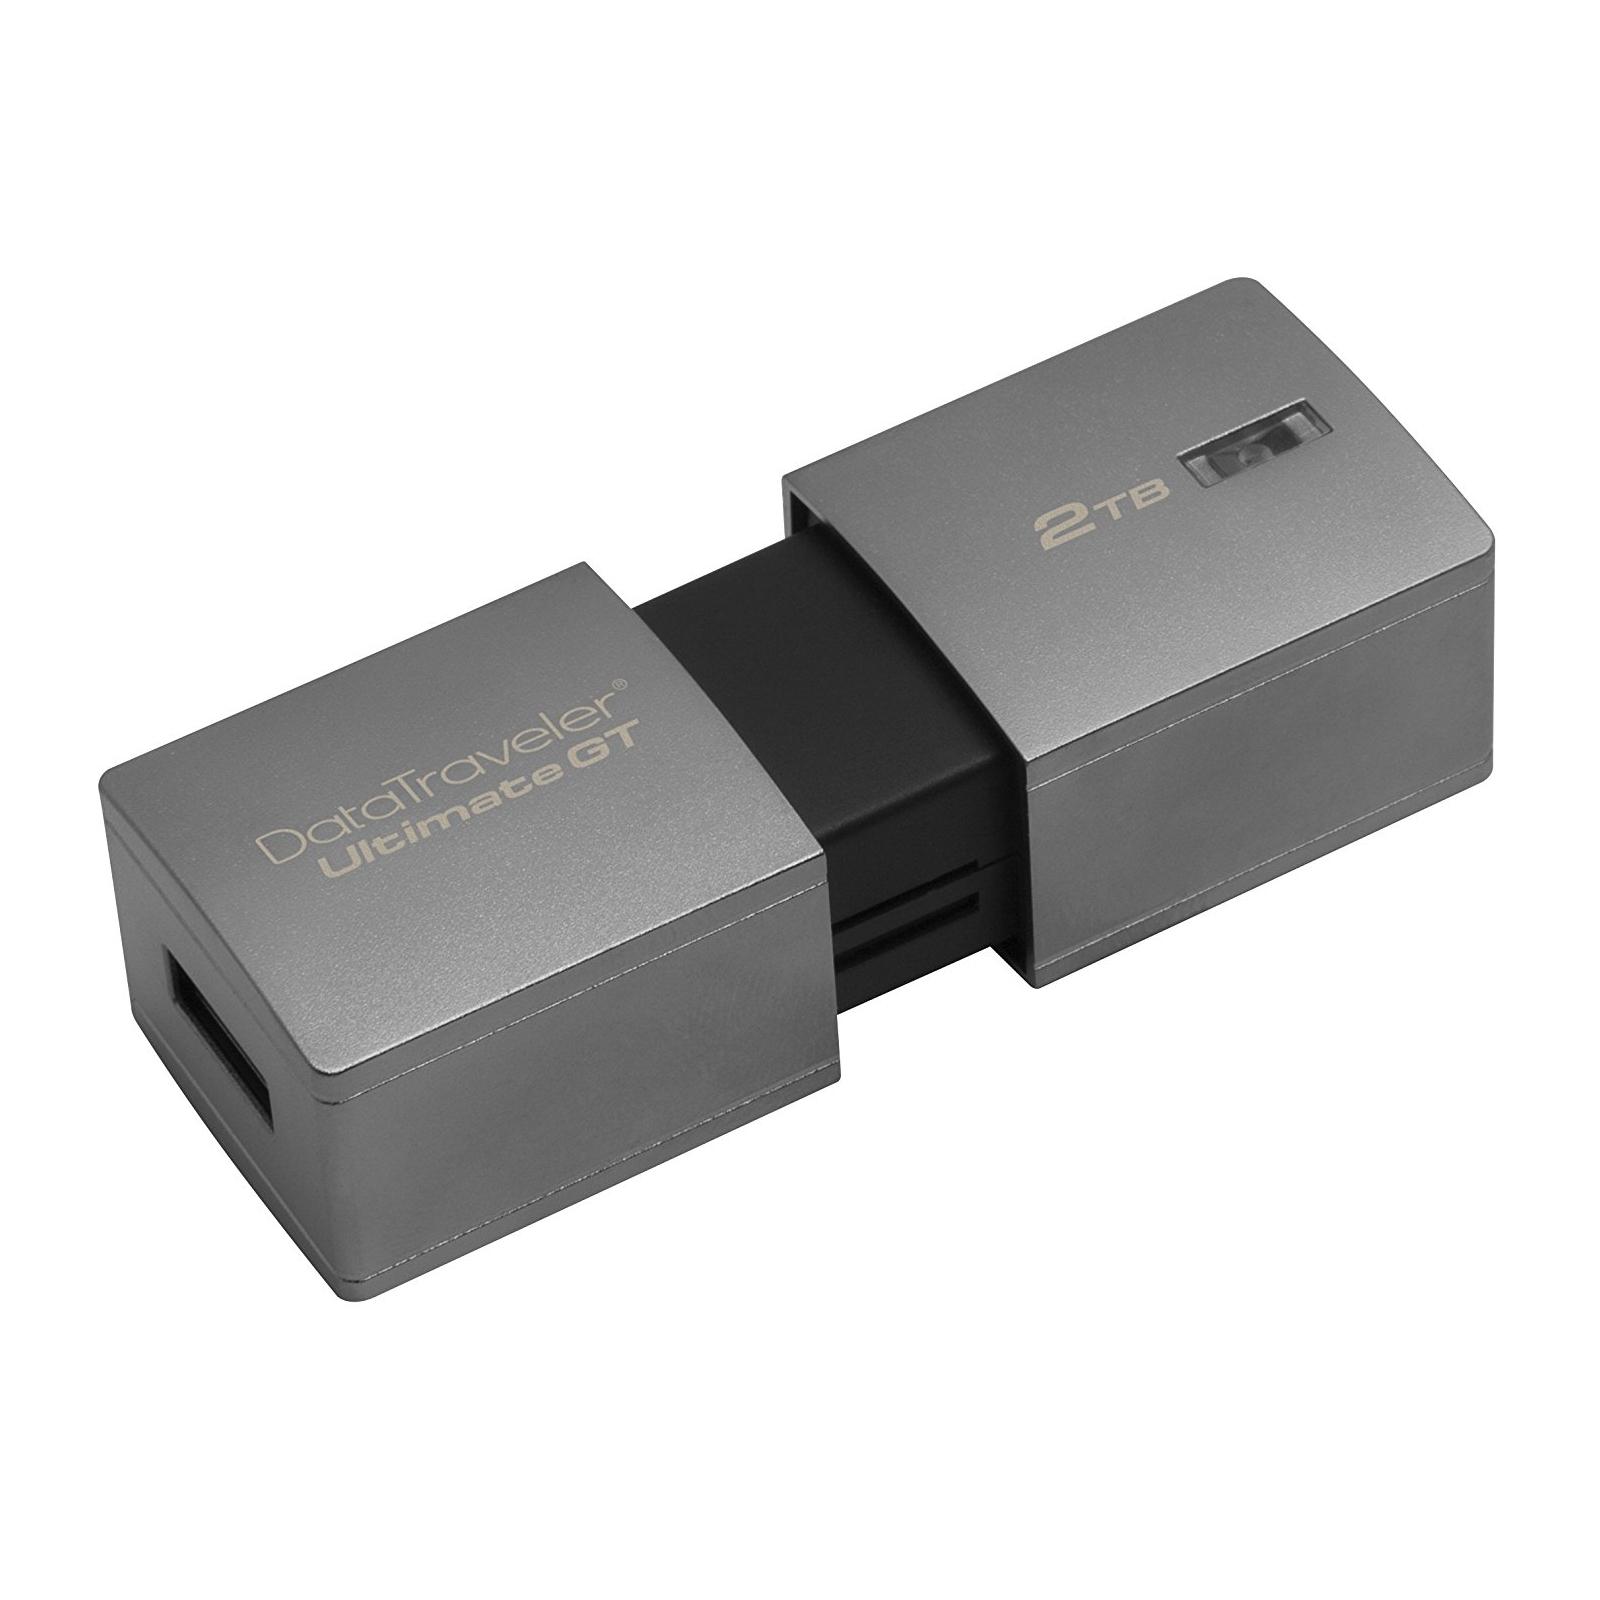 USB флеш накопитель Kingston 2TB DataTraveler Ultimate GT Metal Silver USB 3.1 (DTUGT/2TB) изображение 5